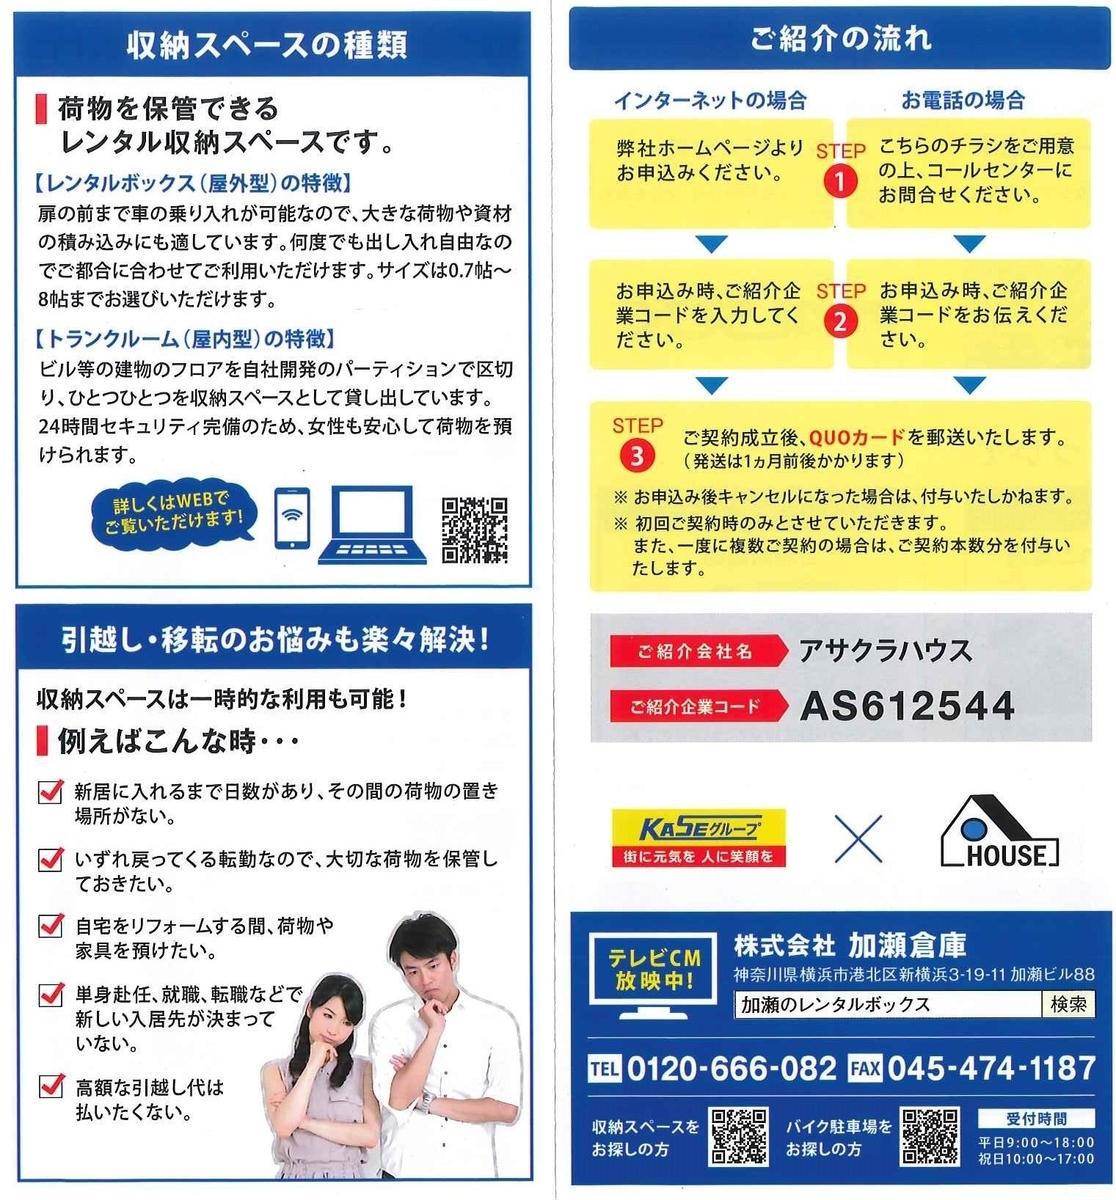 f:id:asakurahouse:20210417100842j:plain